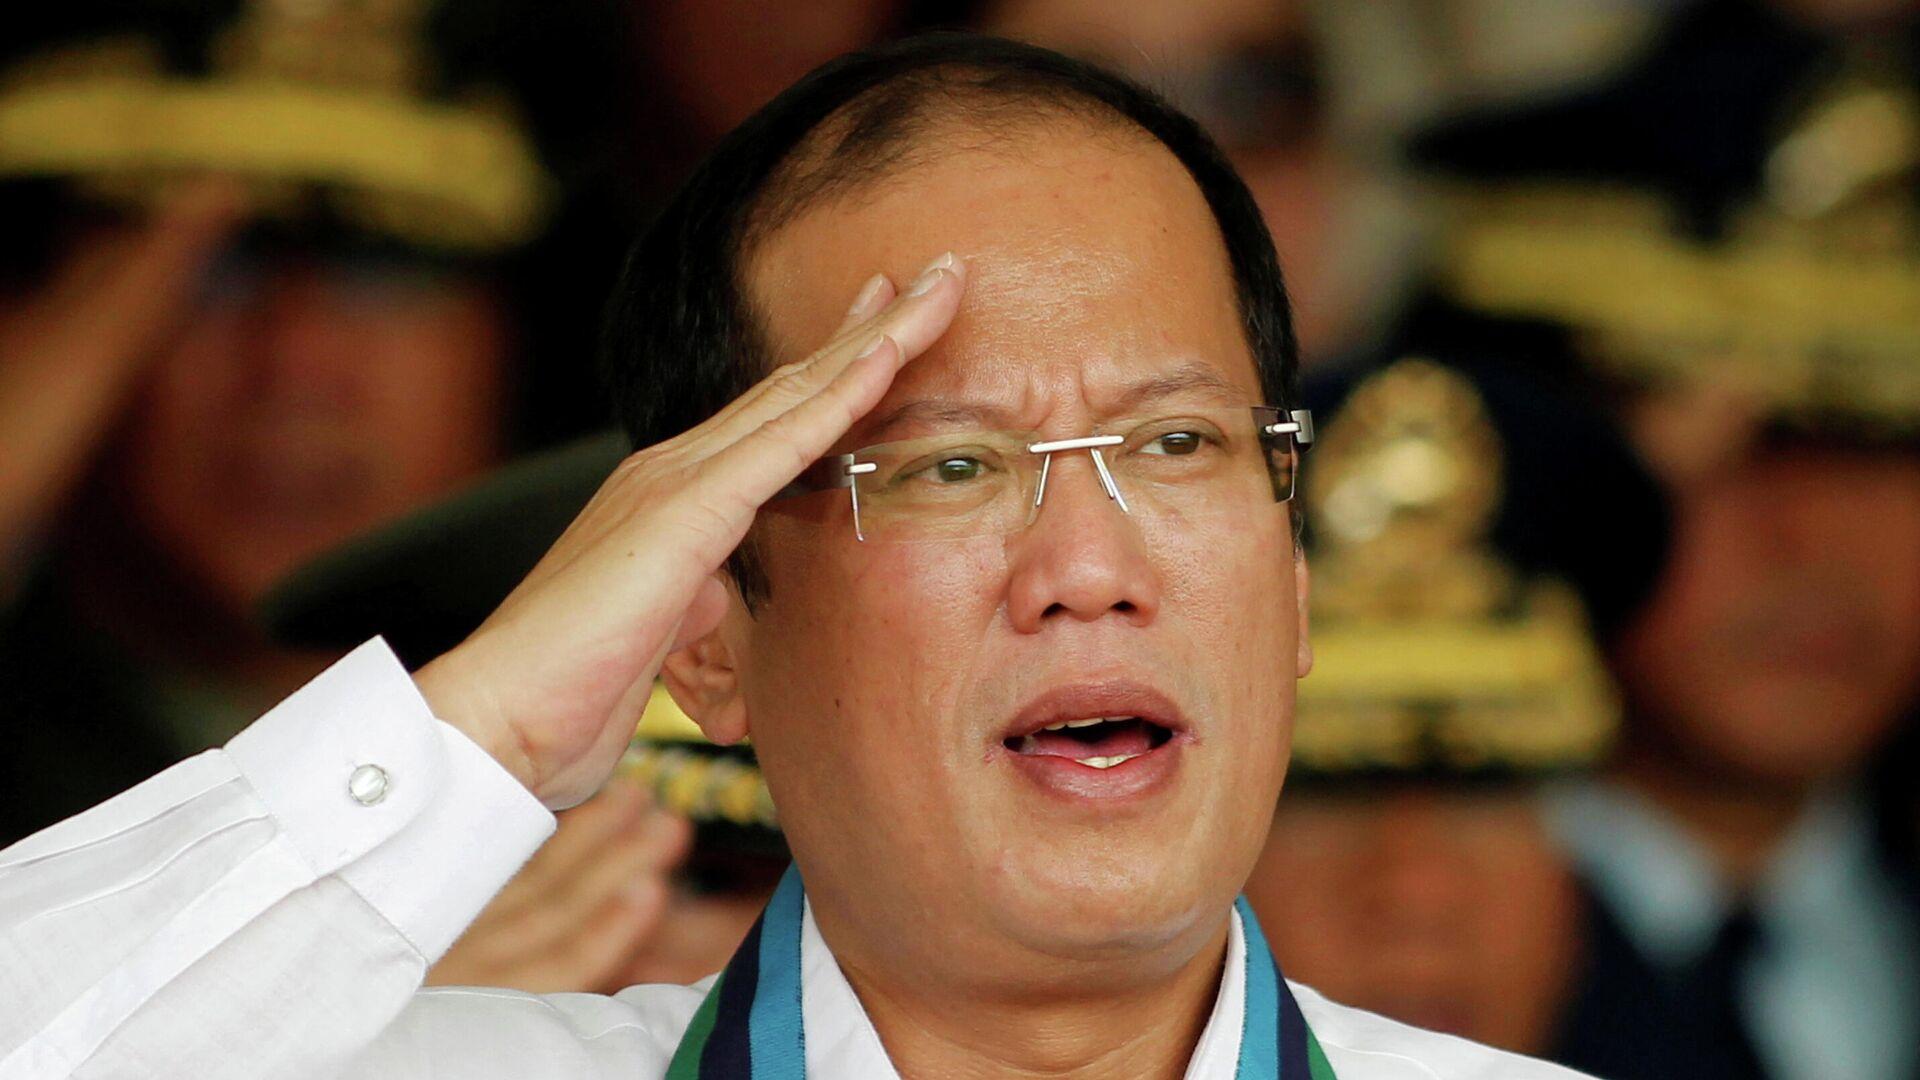 El expresidente filipino Benigno Aquino III  - Sputnik Mundo, 1920, 24.06.2021